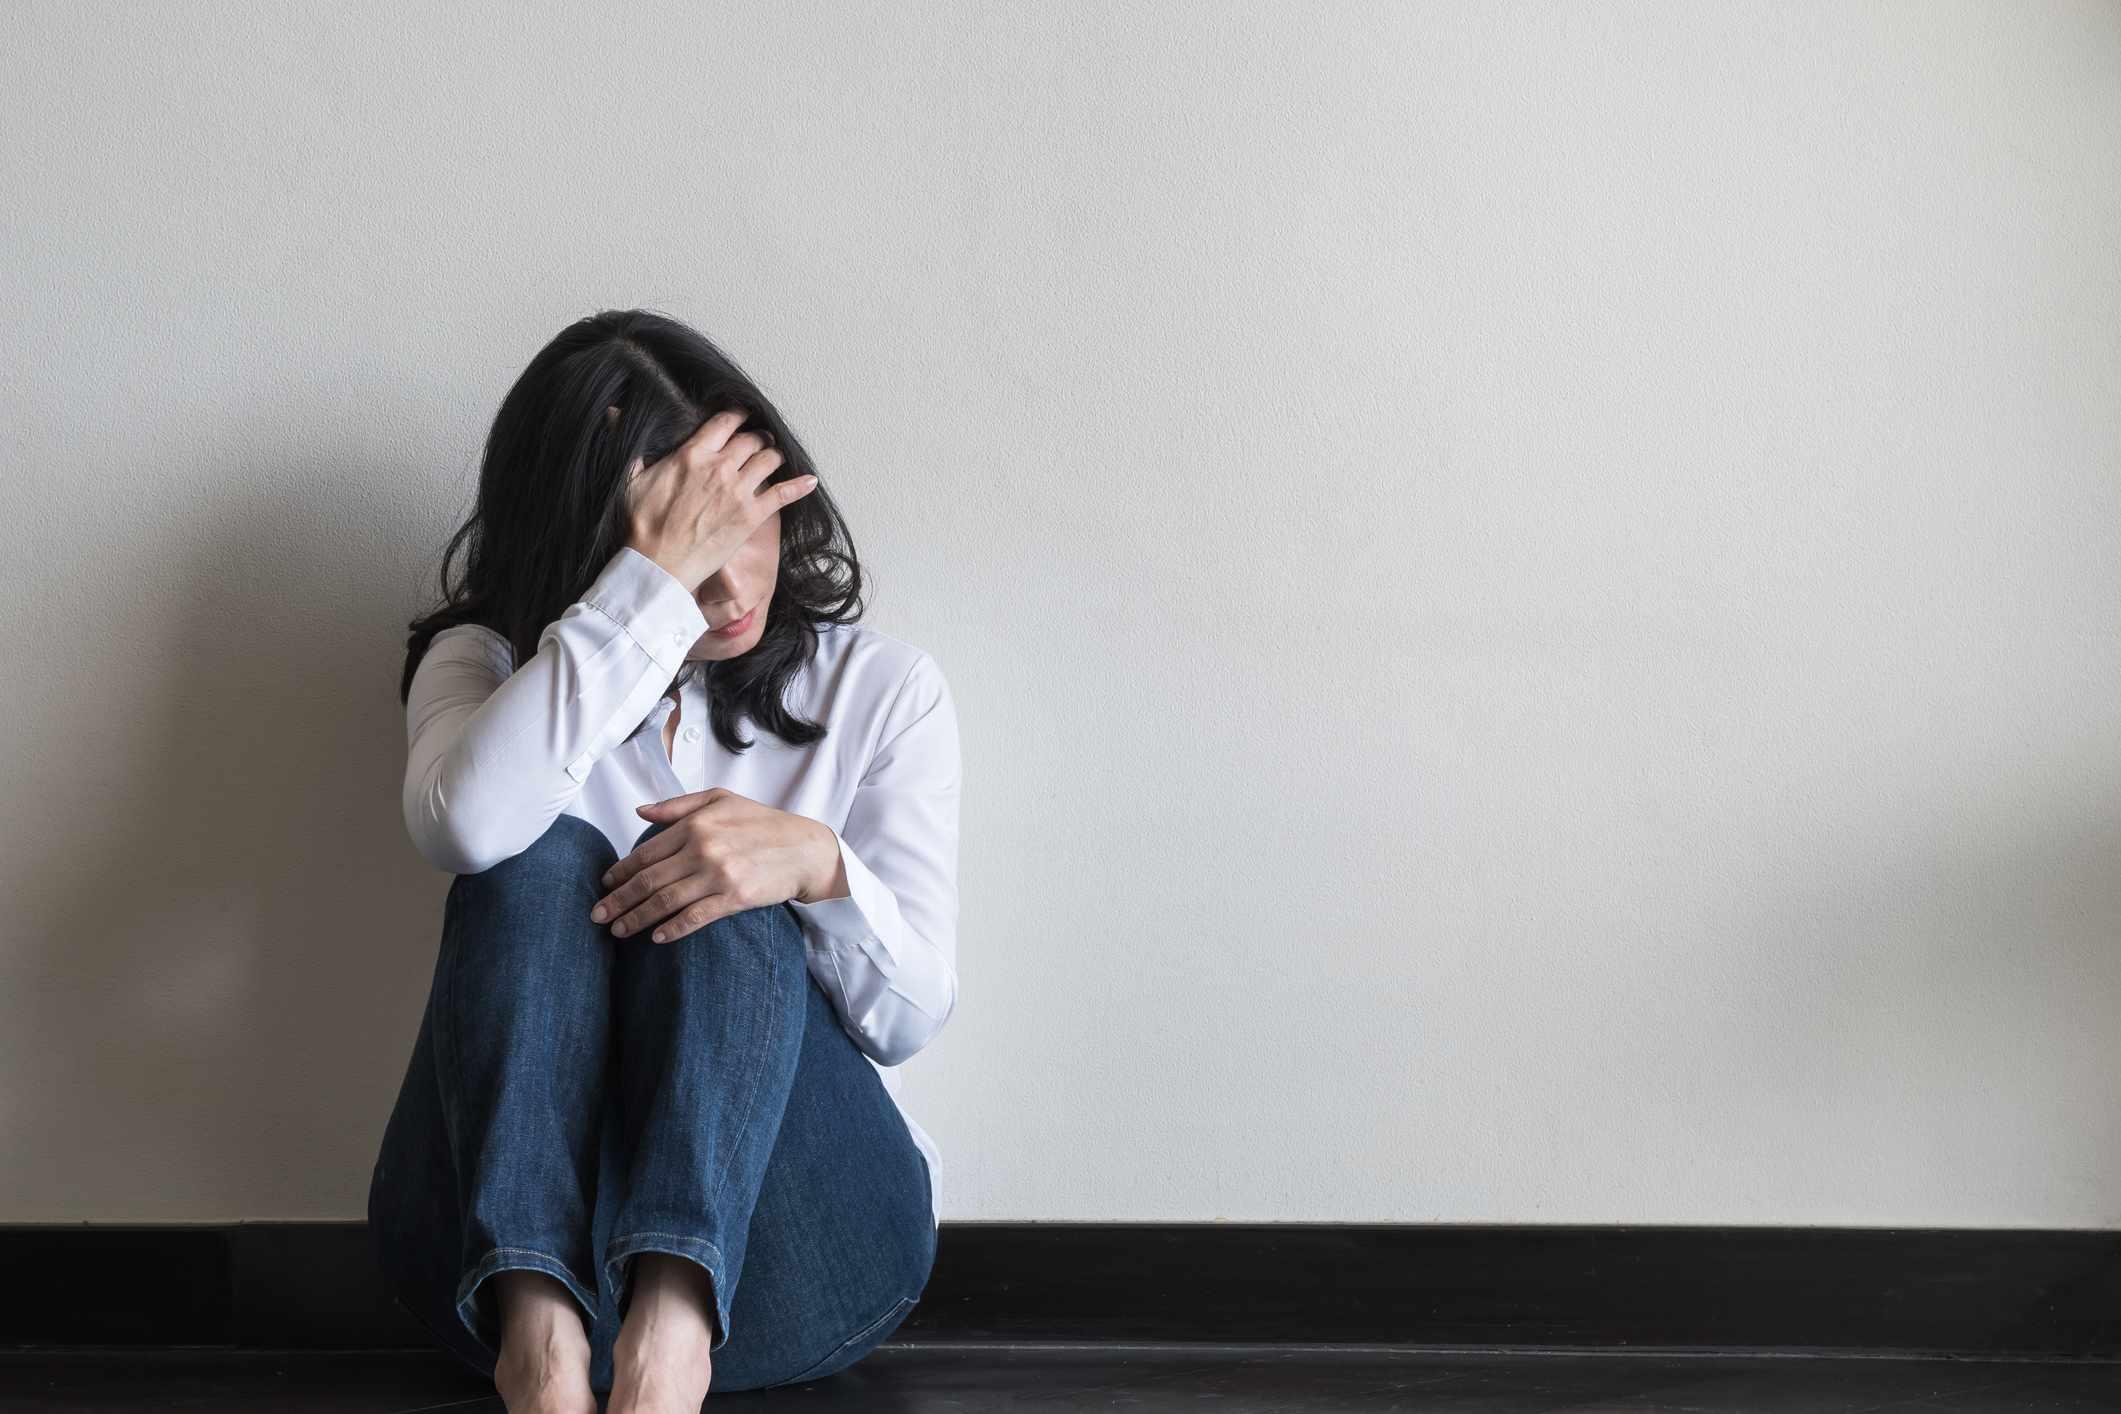 A woman feeling anxious